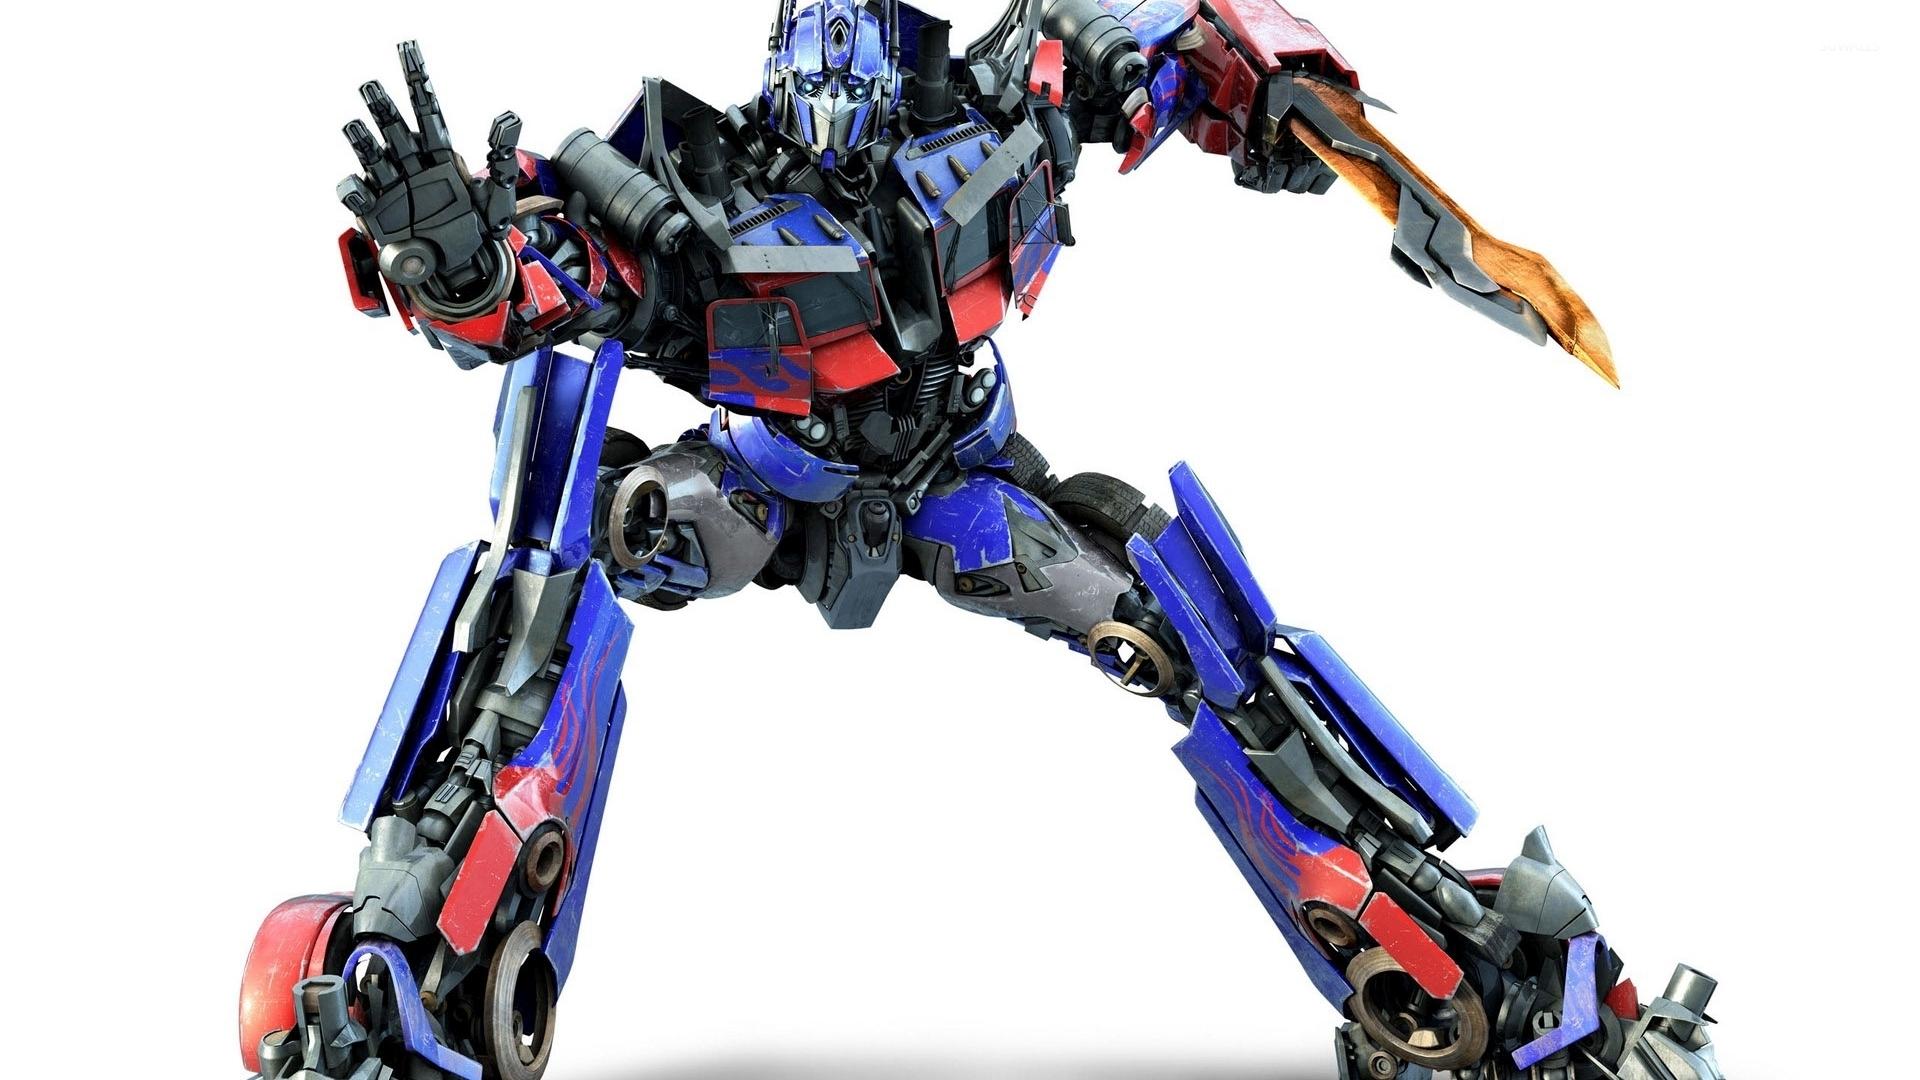 optimus prime transformers 5 wallpaper movie